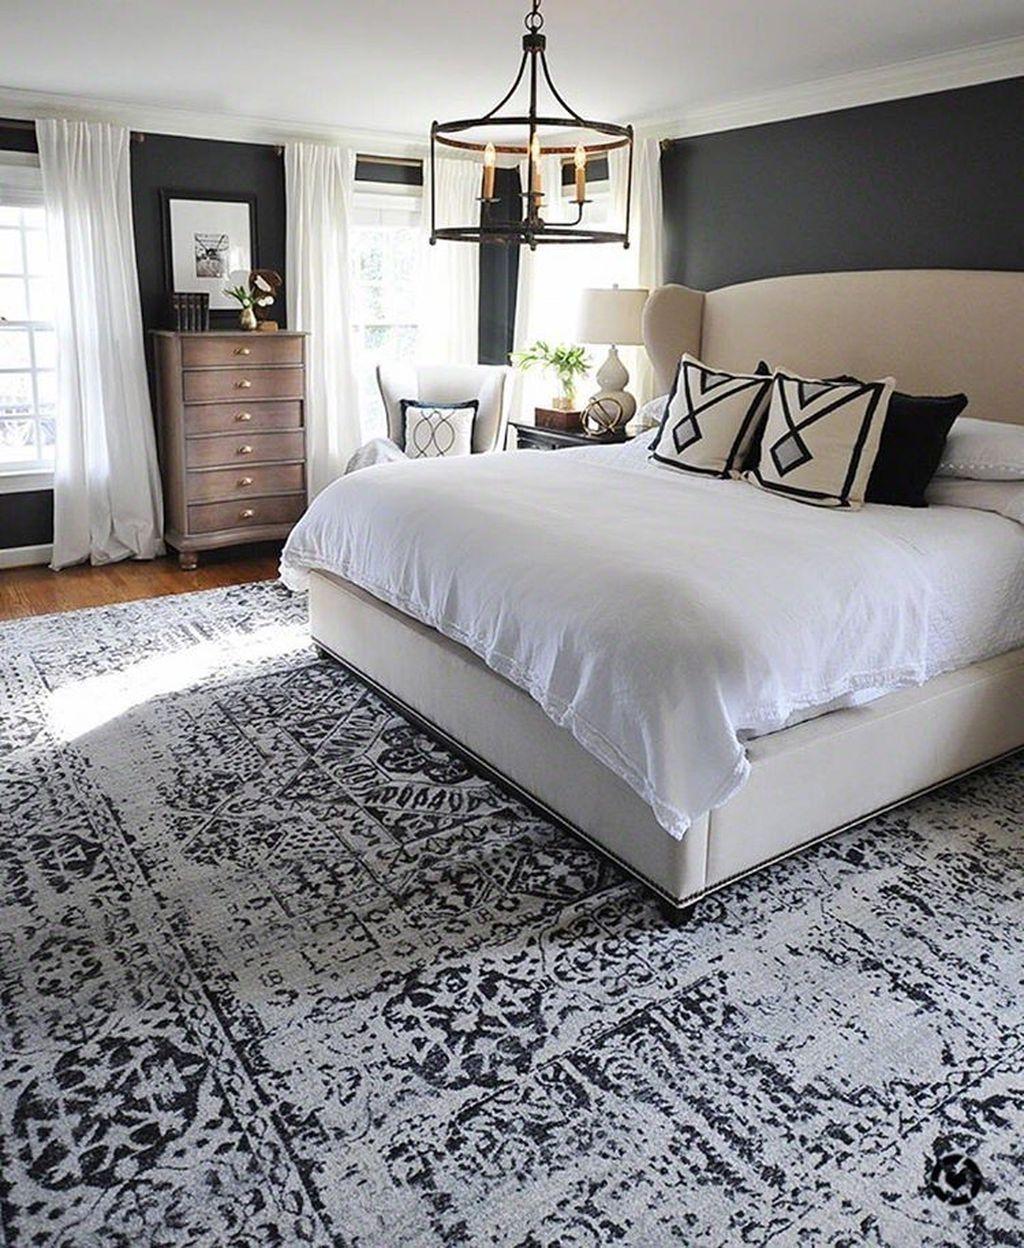 20 magnificient master bedroom decorating ideas bedroom bedroom rh pinterest com